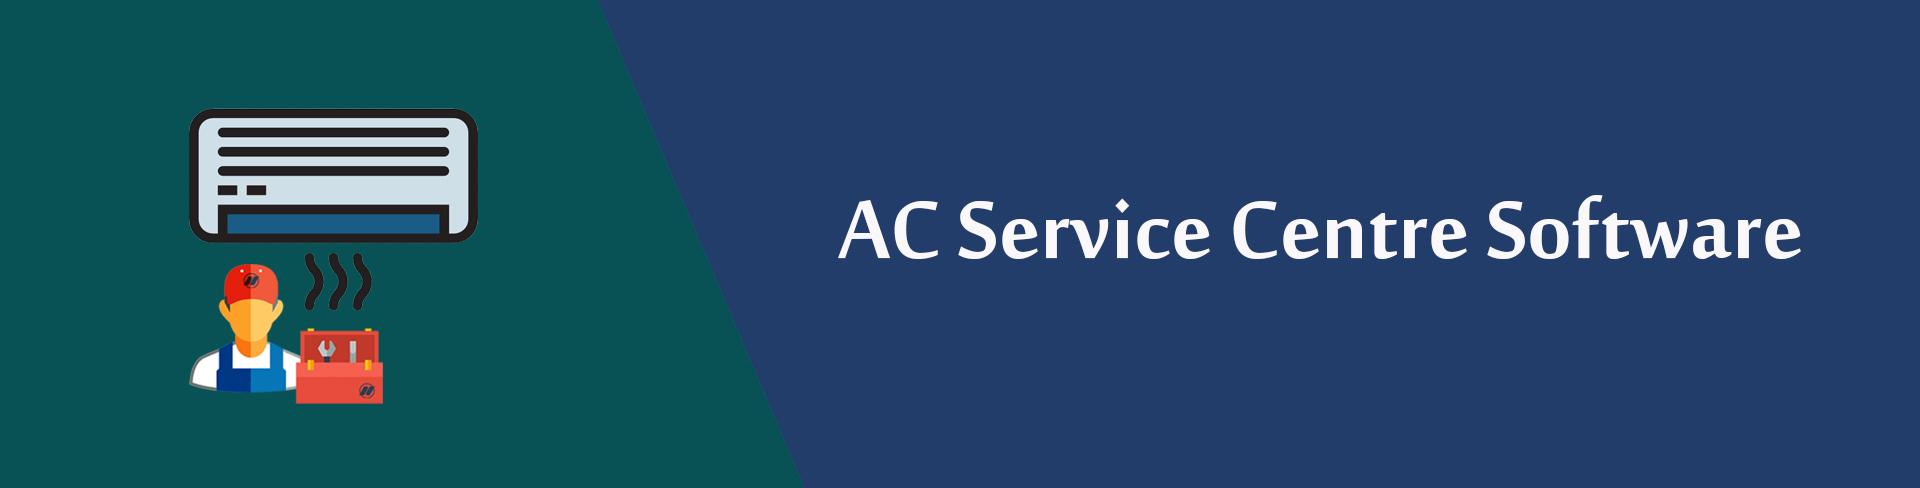 AC Service Centre Software